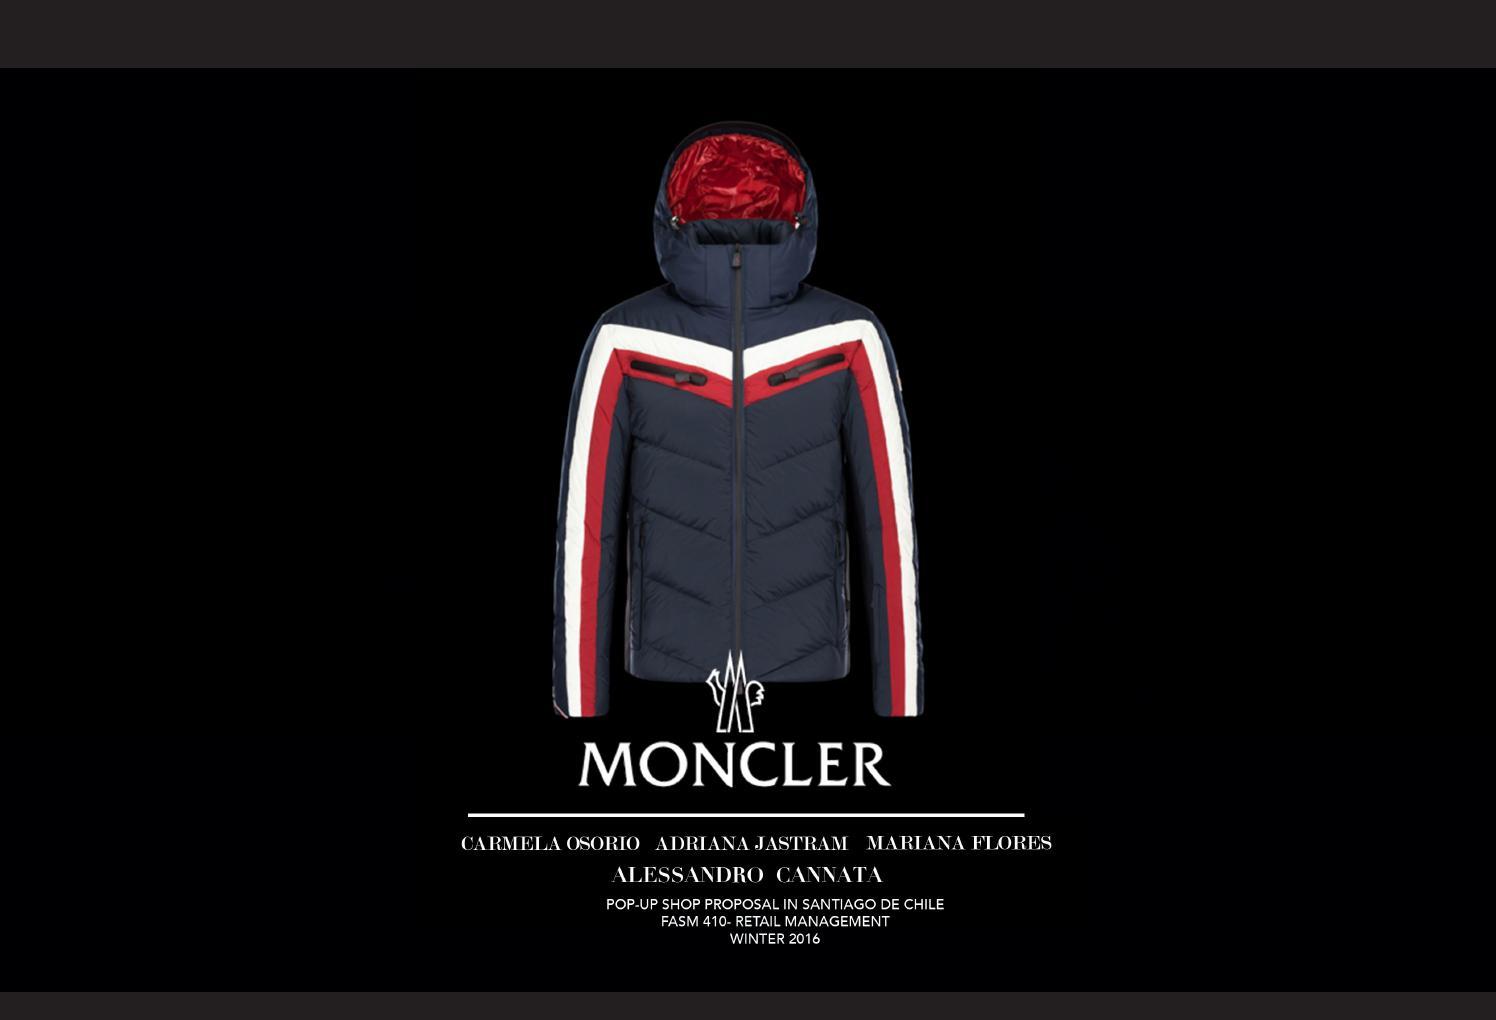 moncler ticker symbol